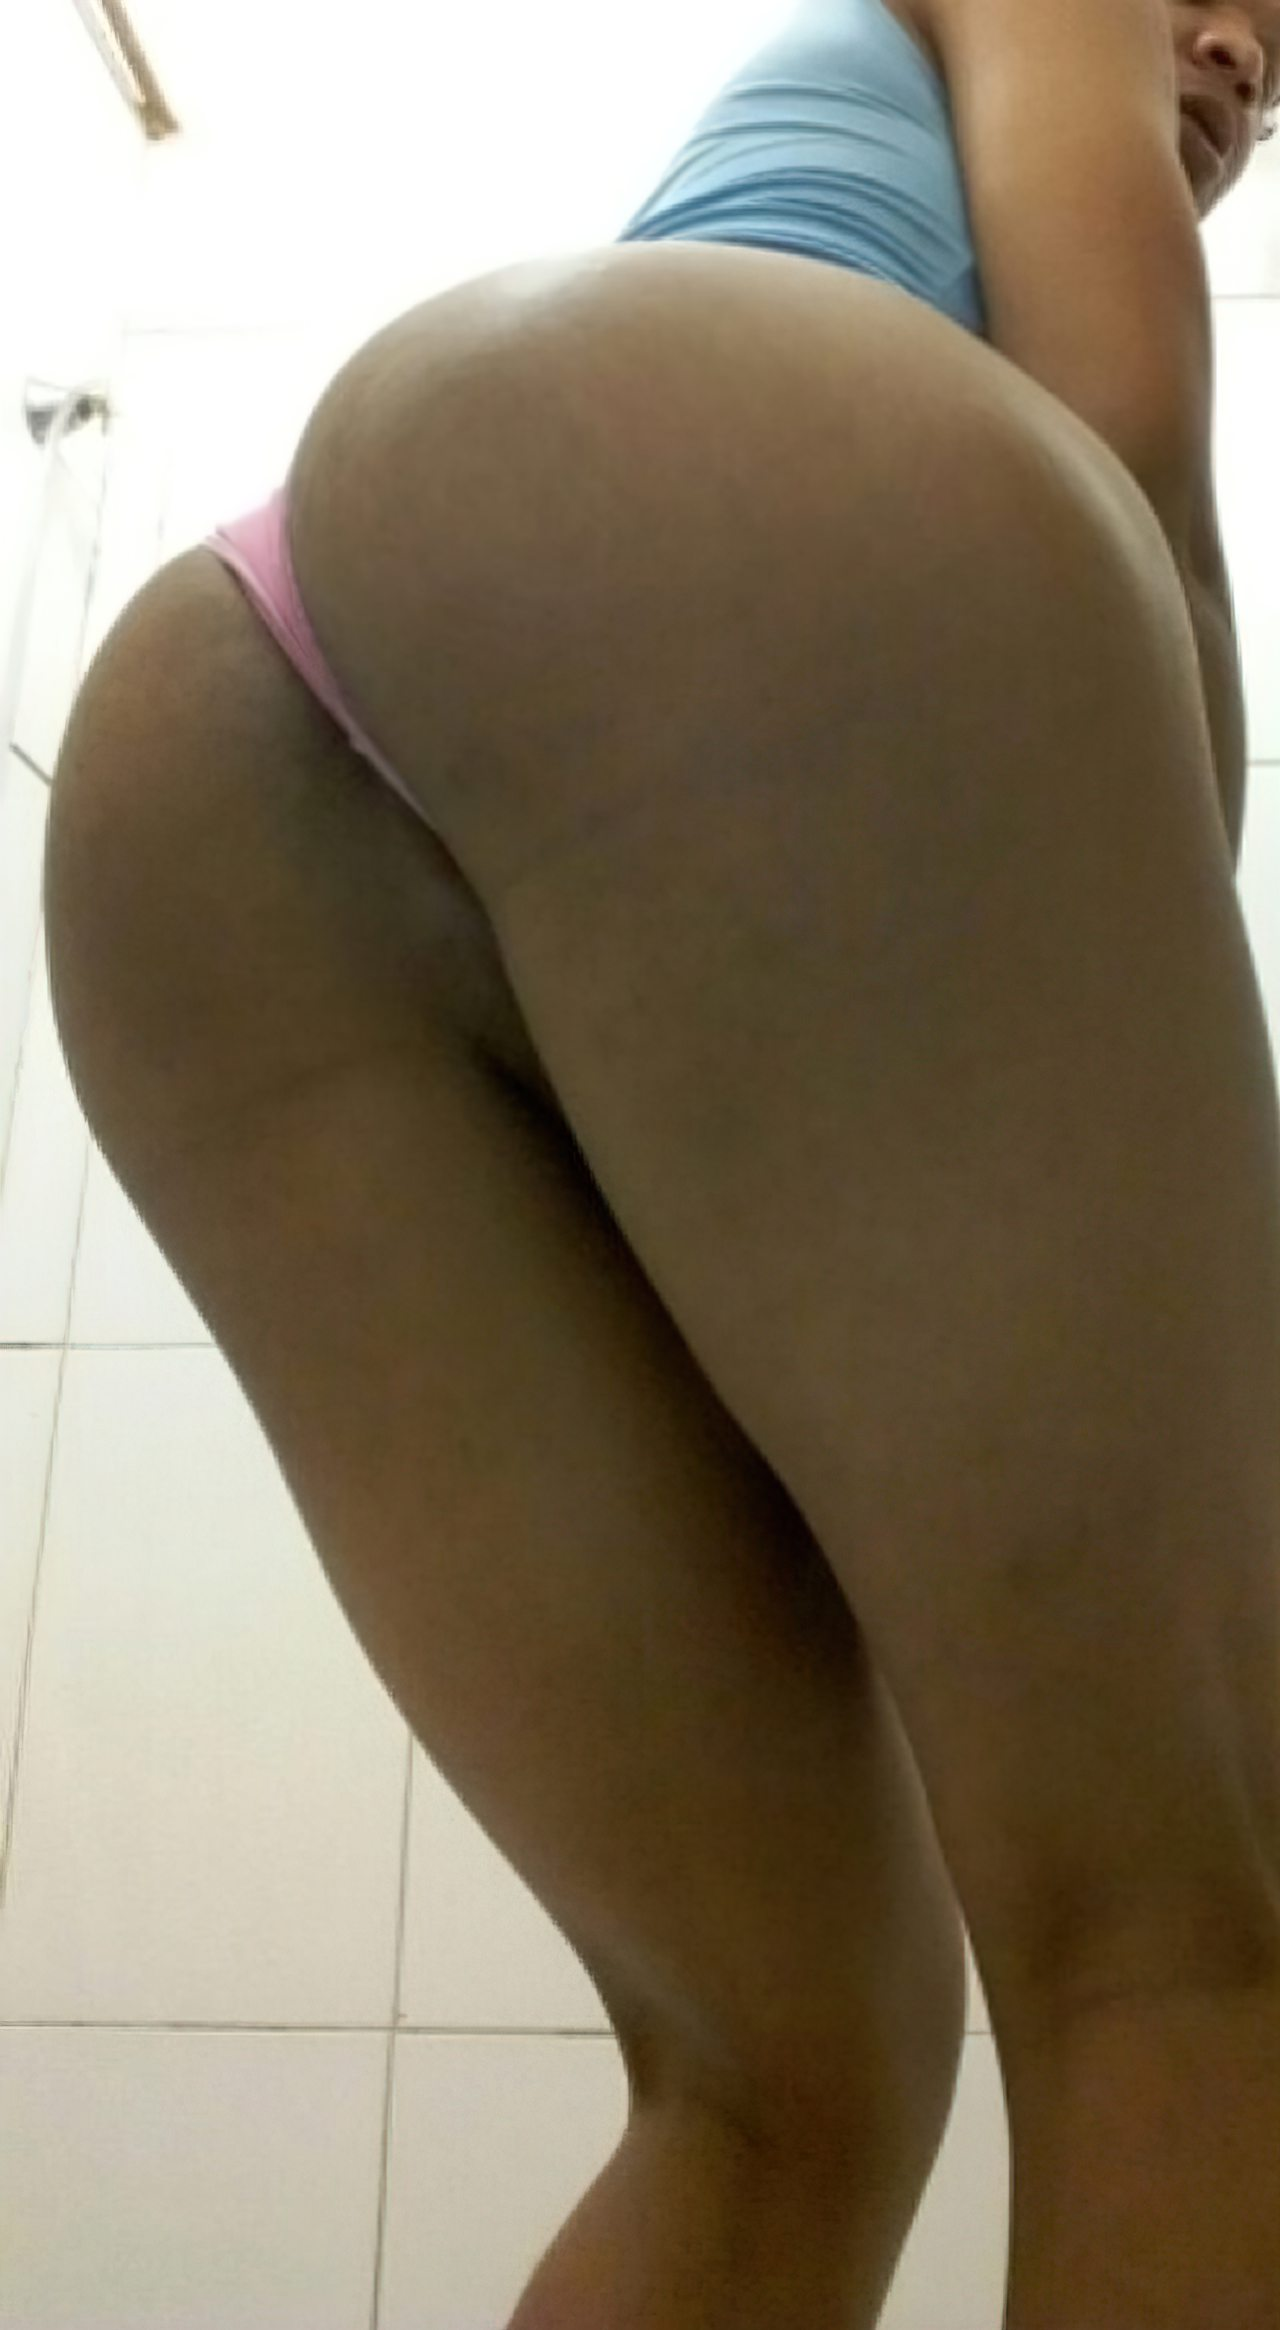 Amadora Safadinha (5)